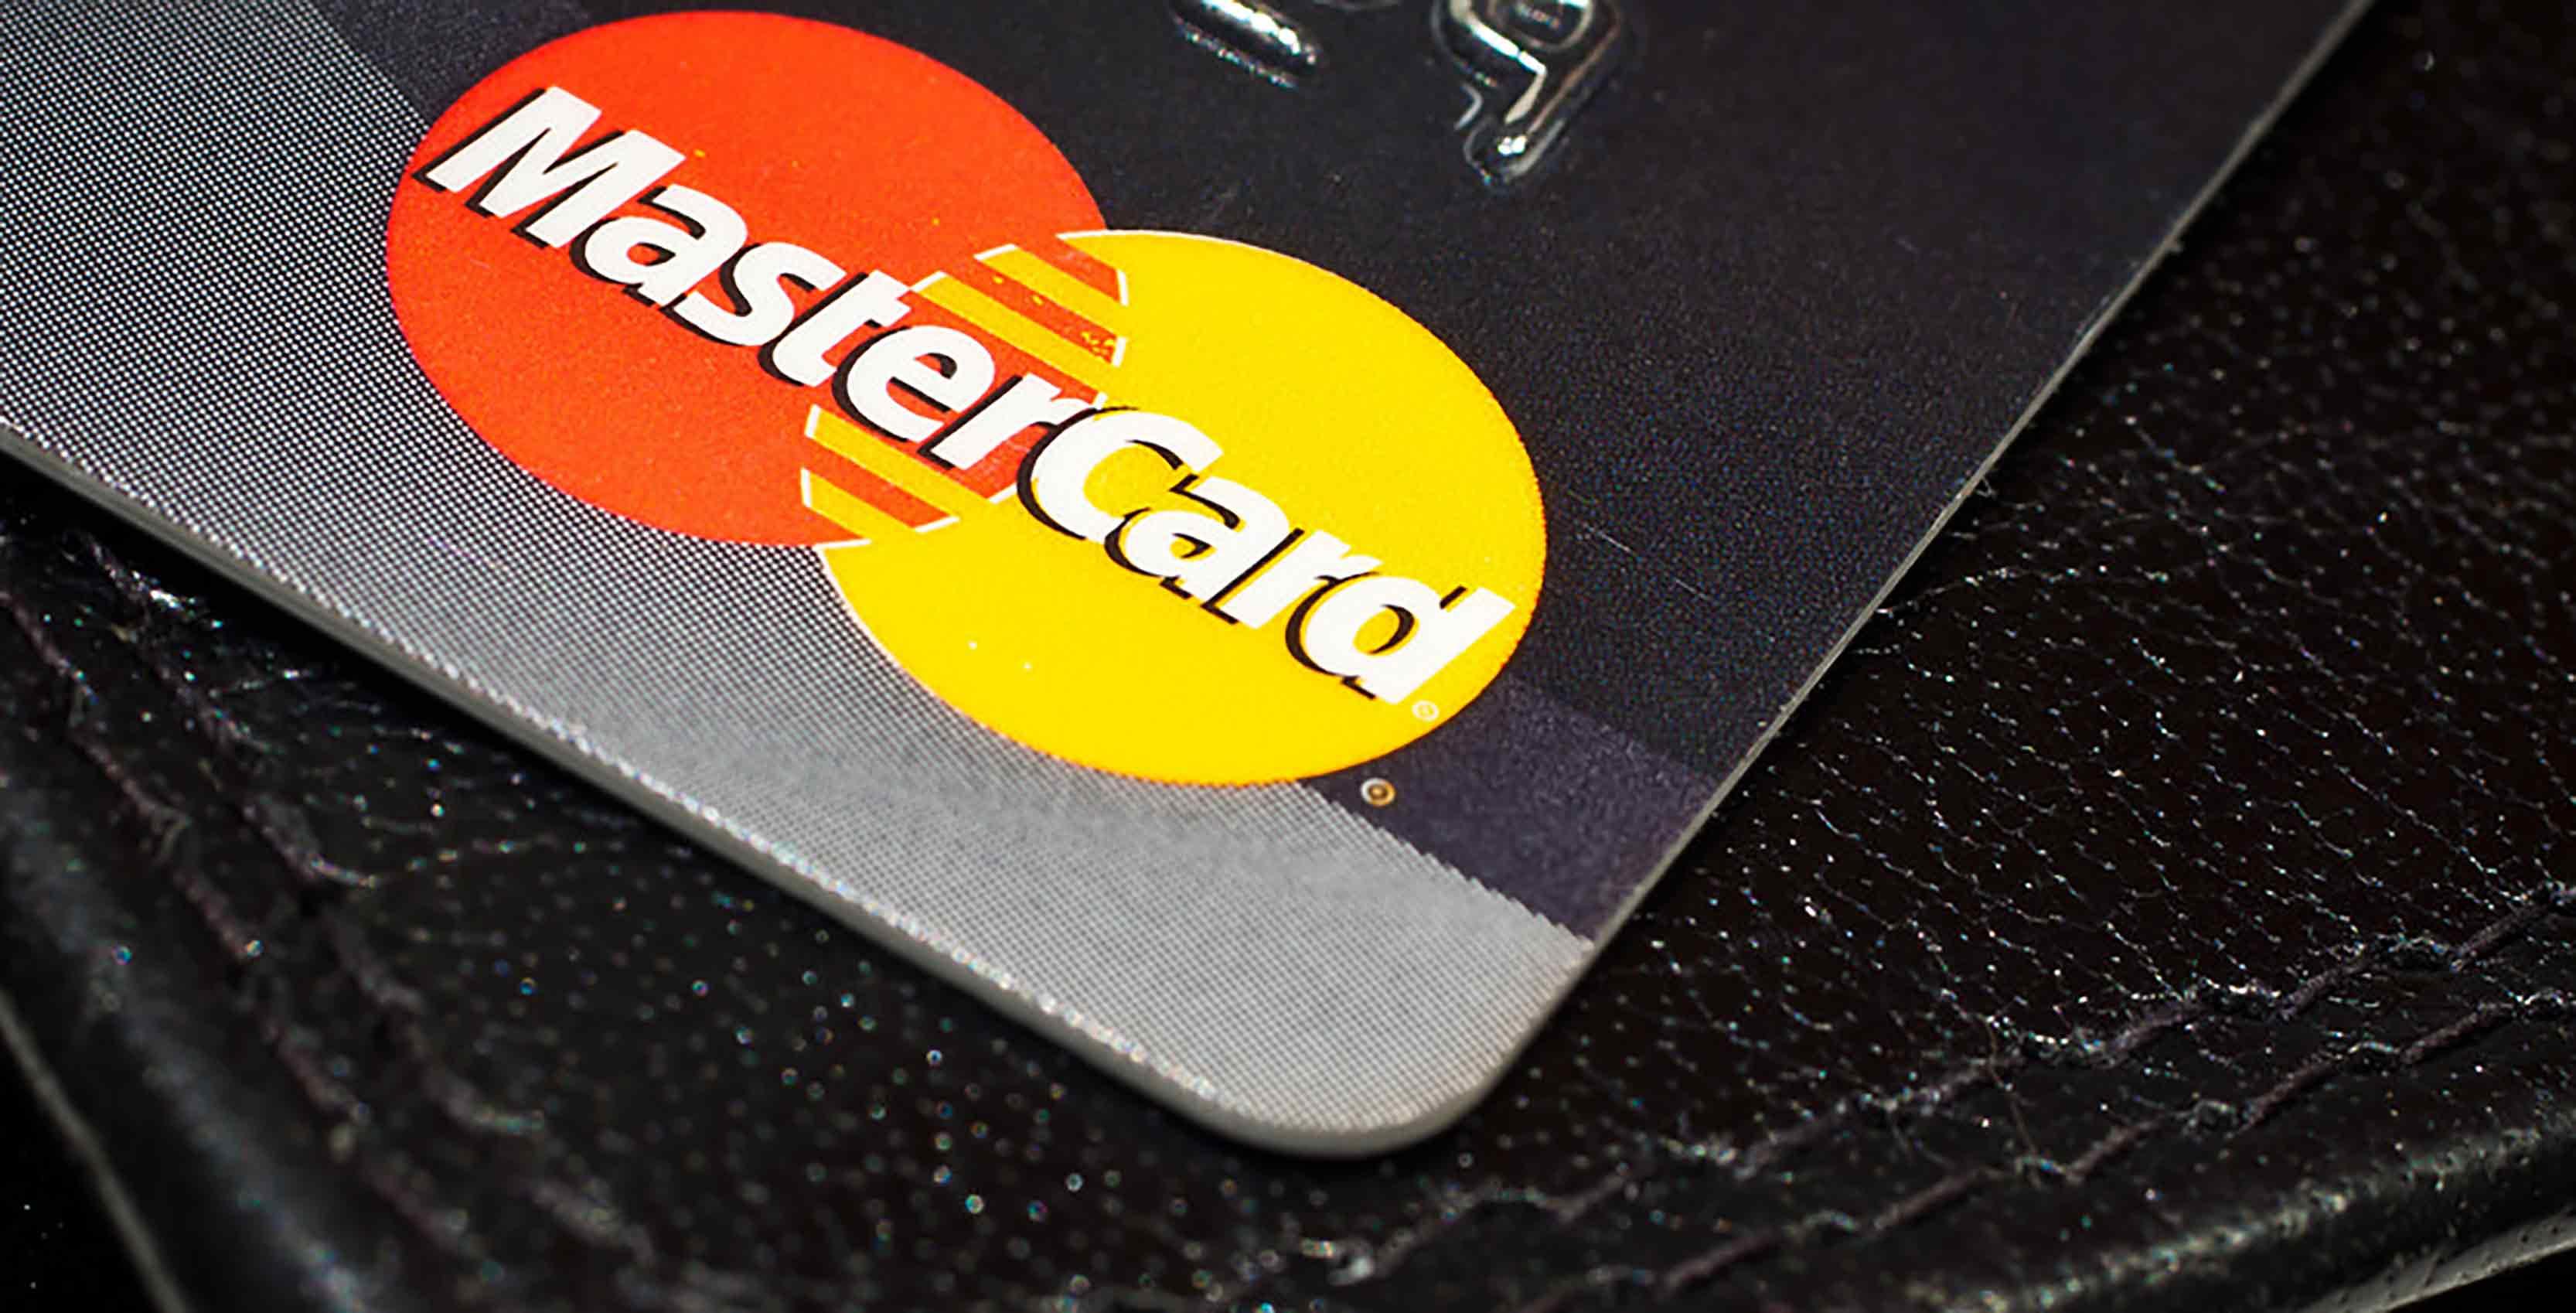 Mastercard fingerprint scanner creditcard